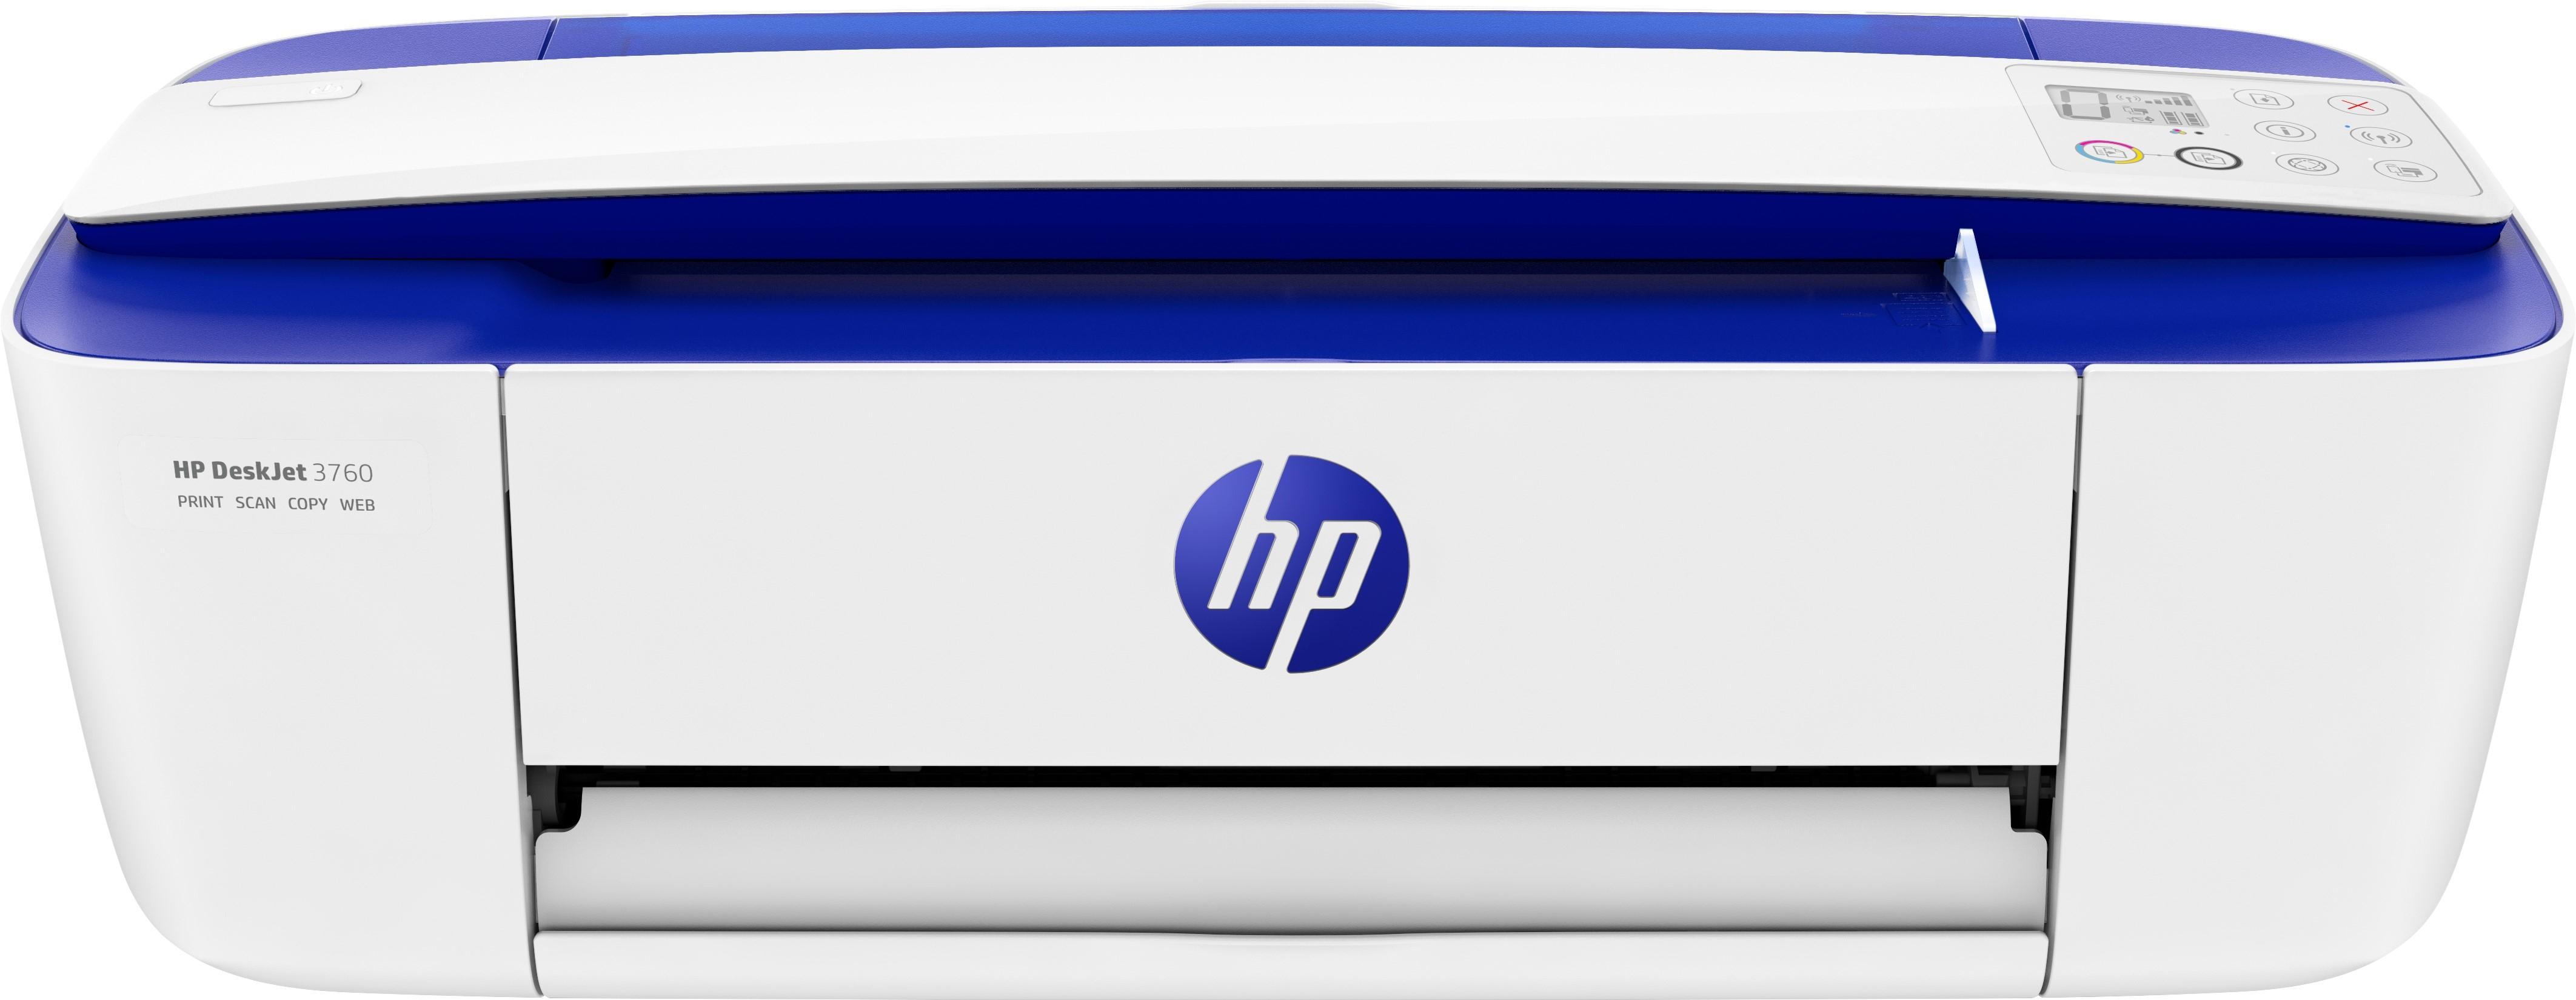 HP DeskJet 3760 Getto termico d'inchiostro 19 ppm 1200 x 1200 DPI A4 Wi-Fi